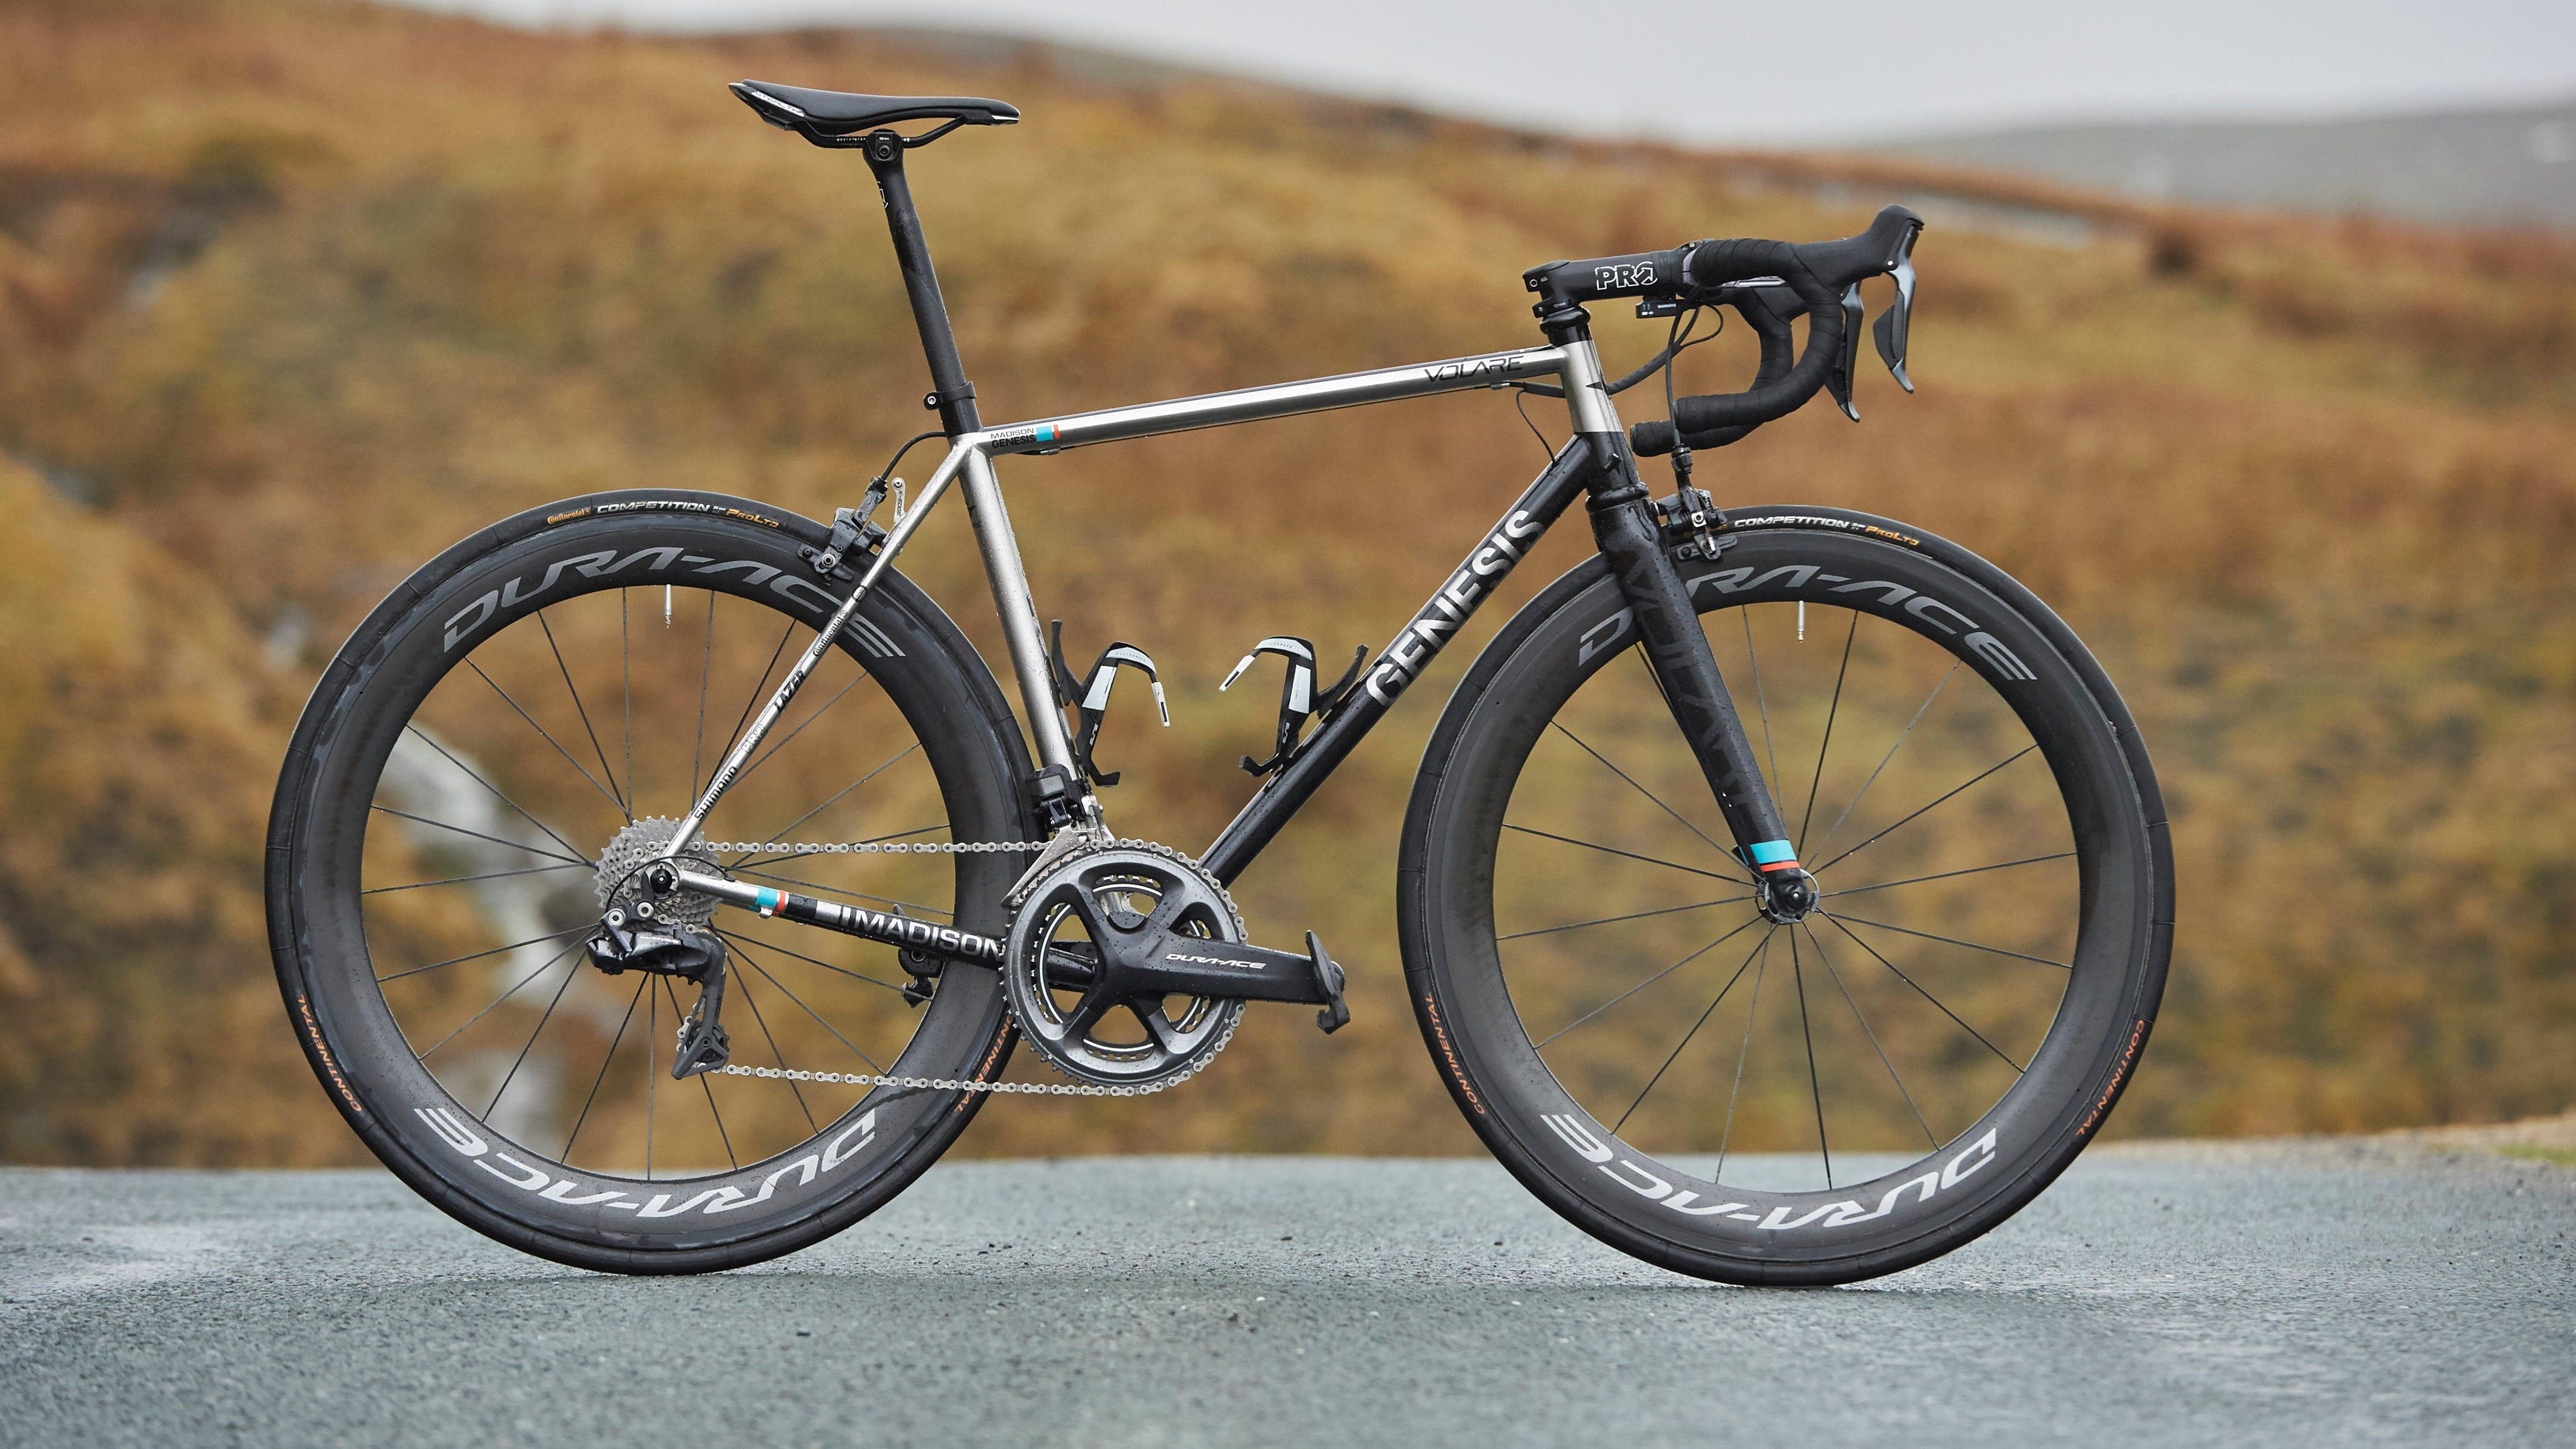 Bikes we love: Rich Handley's gorgeous Genesis Volare 953